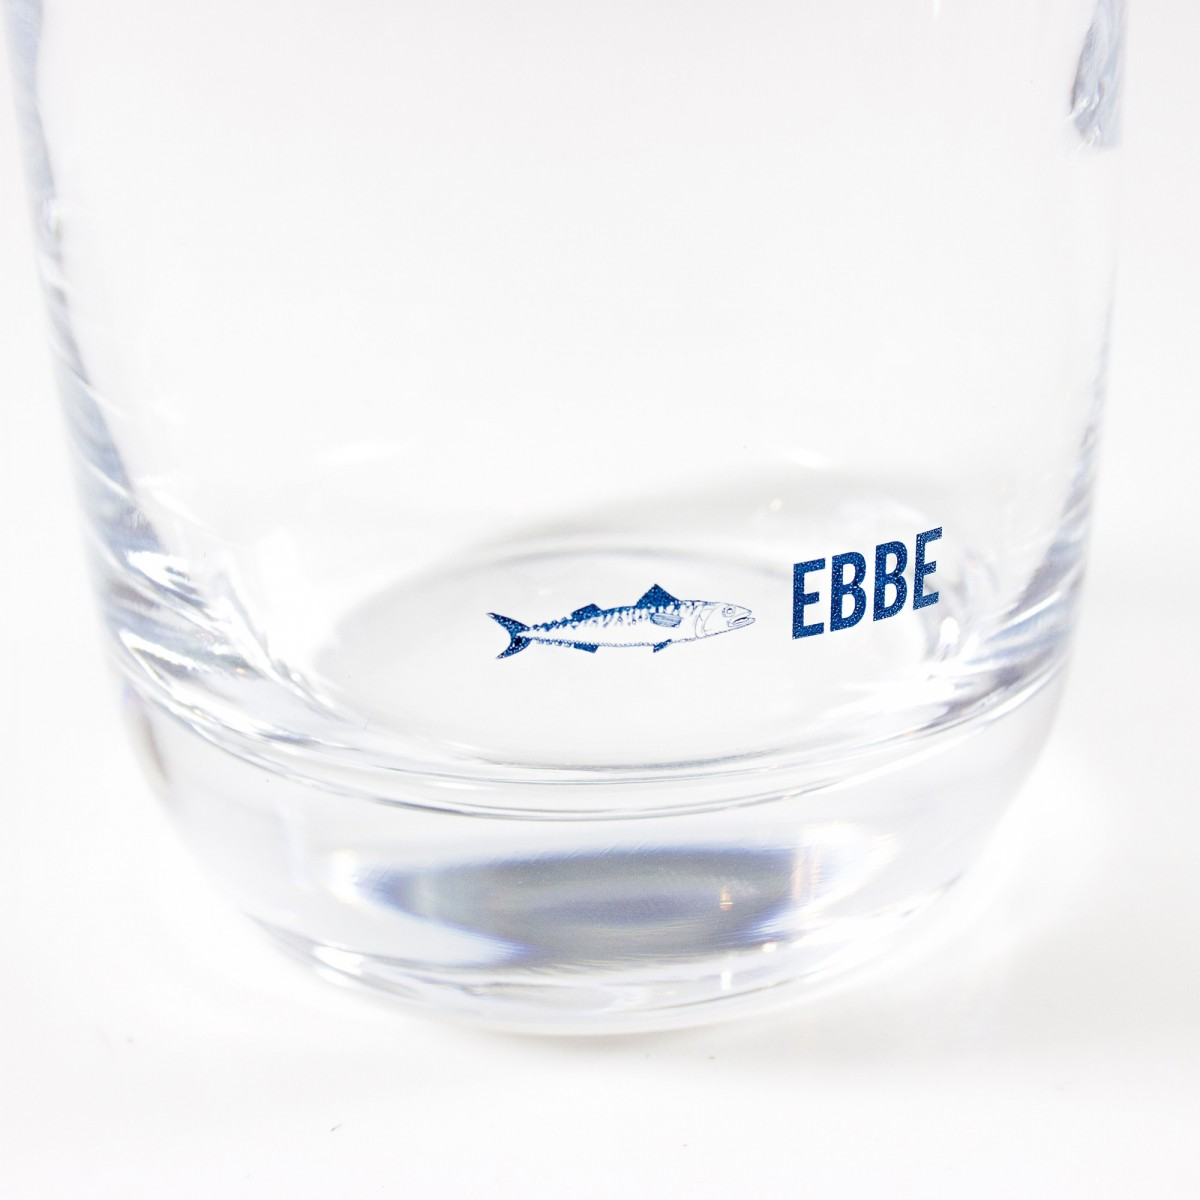 Bow & Hummingbird Kristallglas Ebbe & Flut